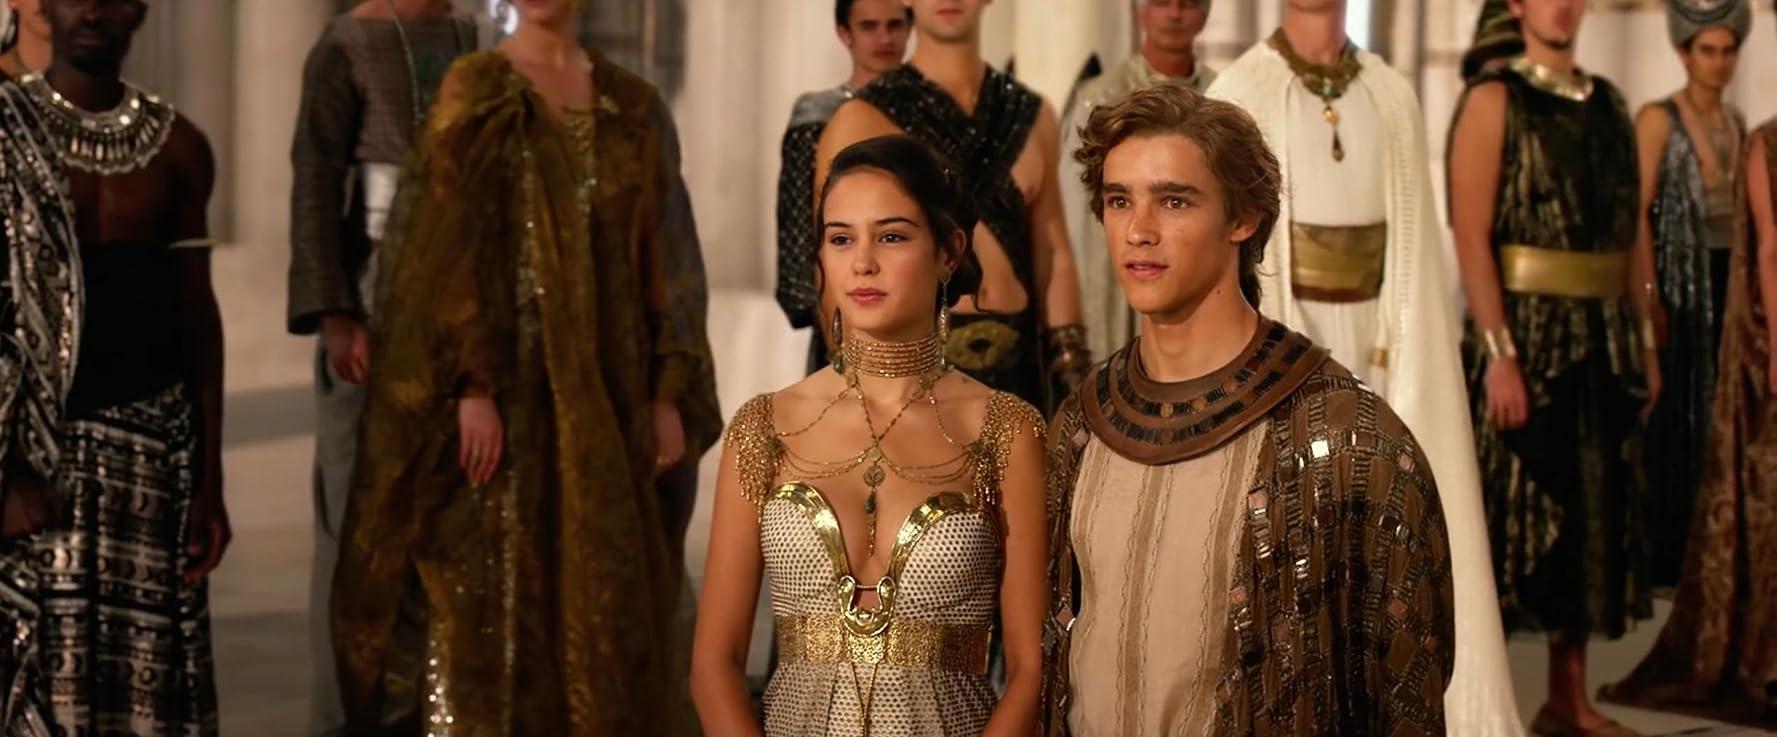 Potongan Film Gods of Egypt